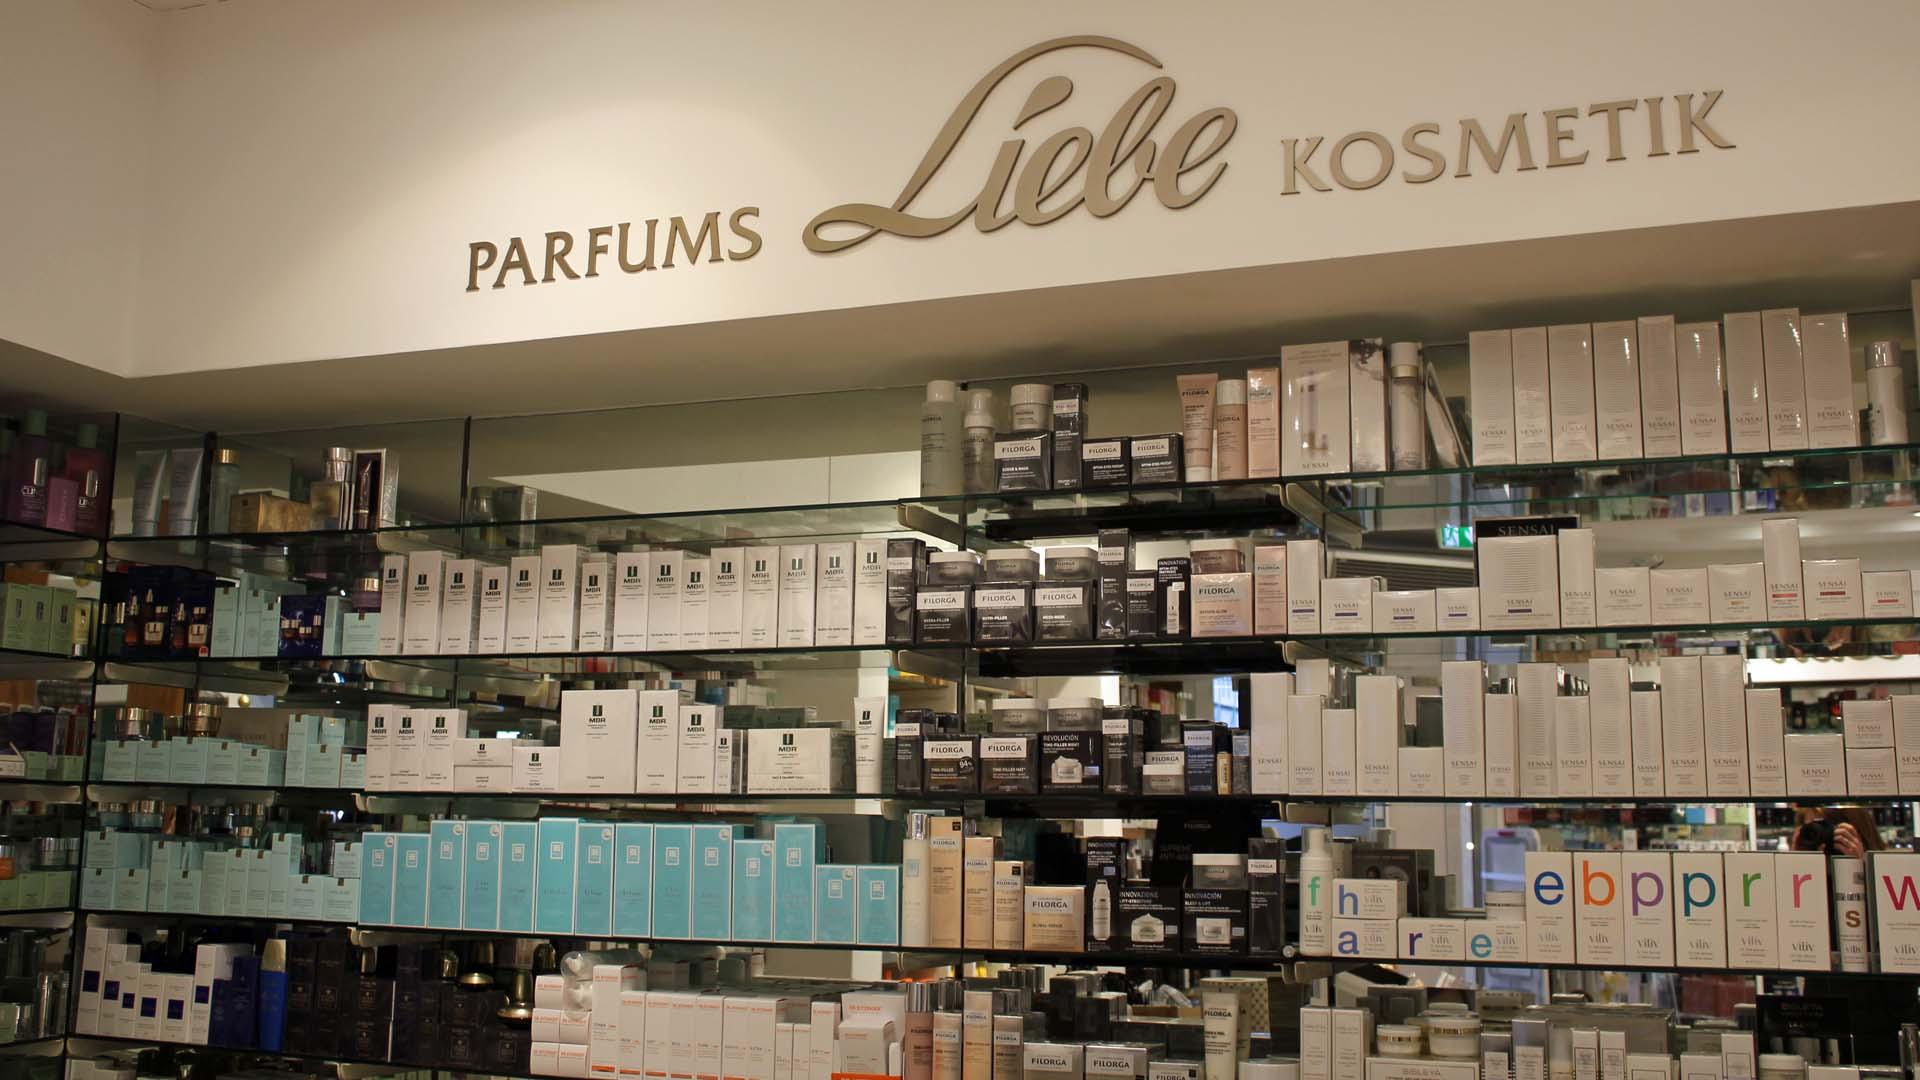 celle-parfums-kosmetik-liebe-3.jpg